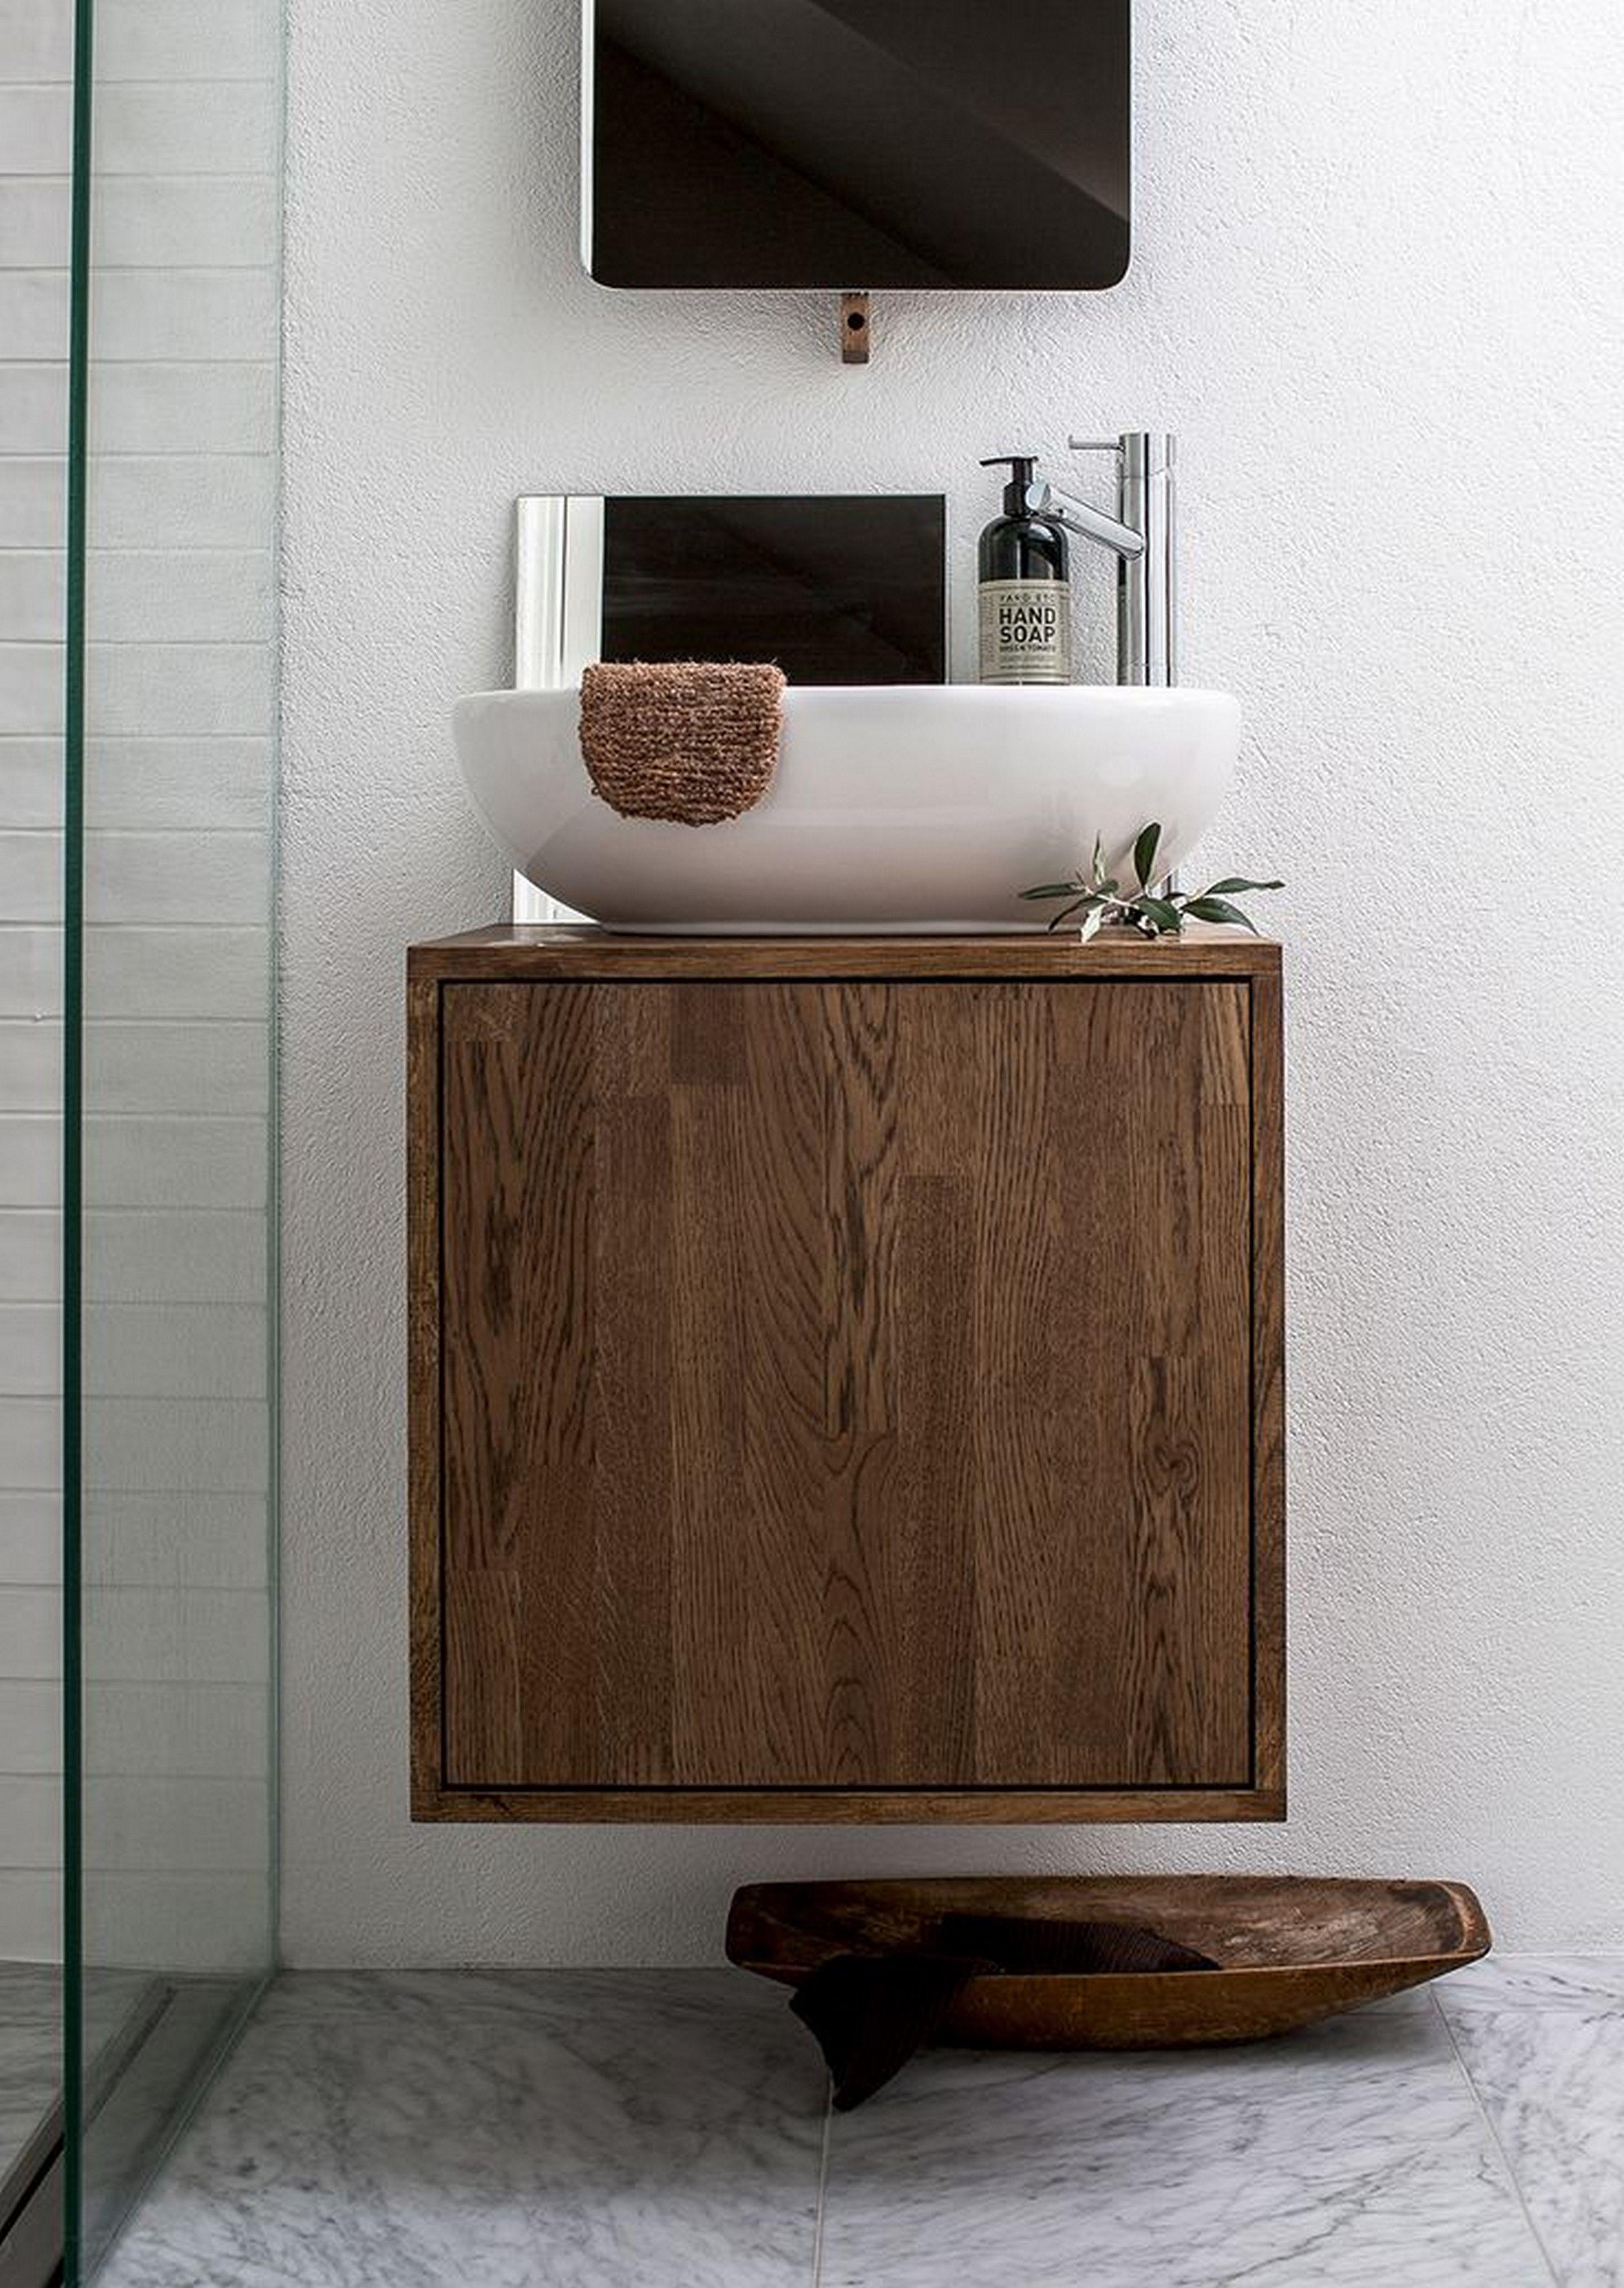 Bathroom Category Decorating Ideas On A Budget Vanities Floor Tile